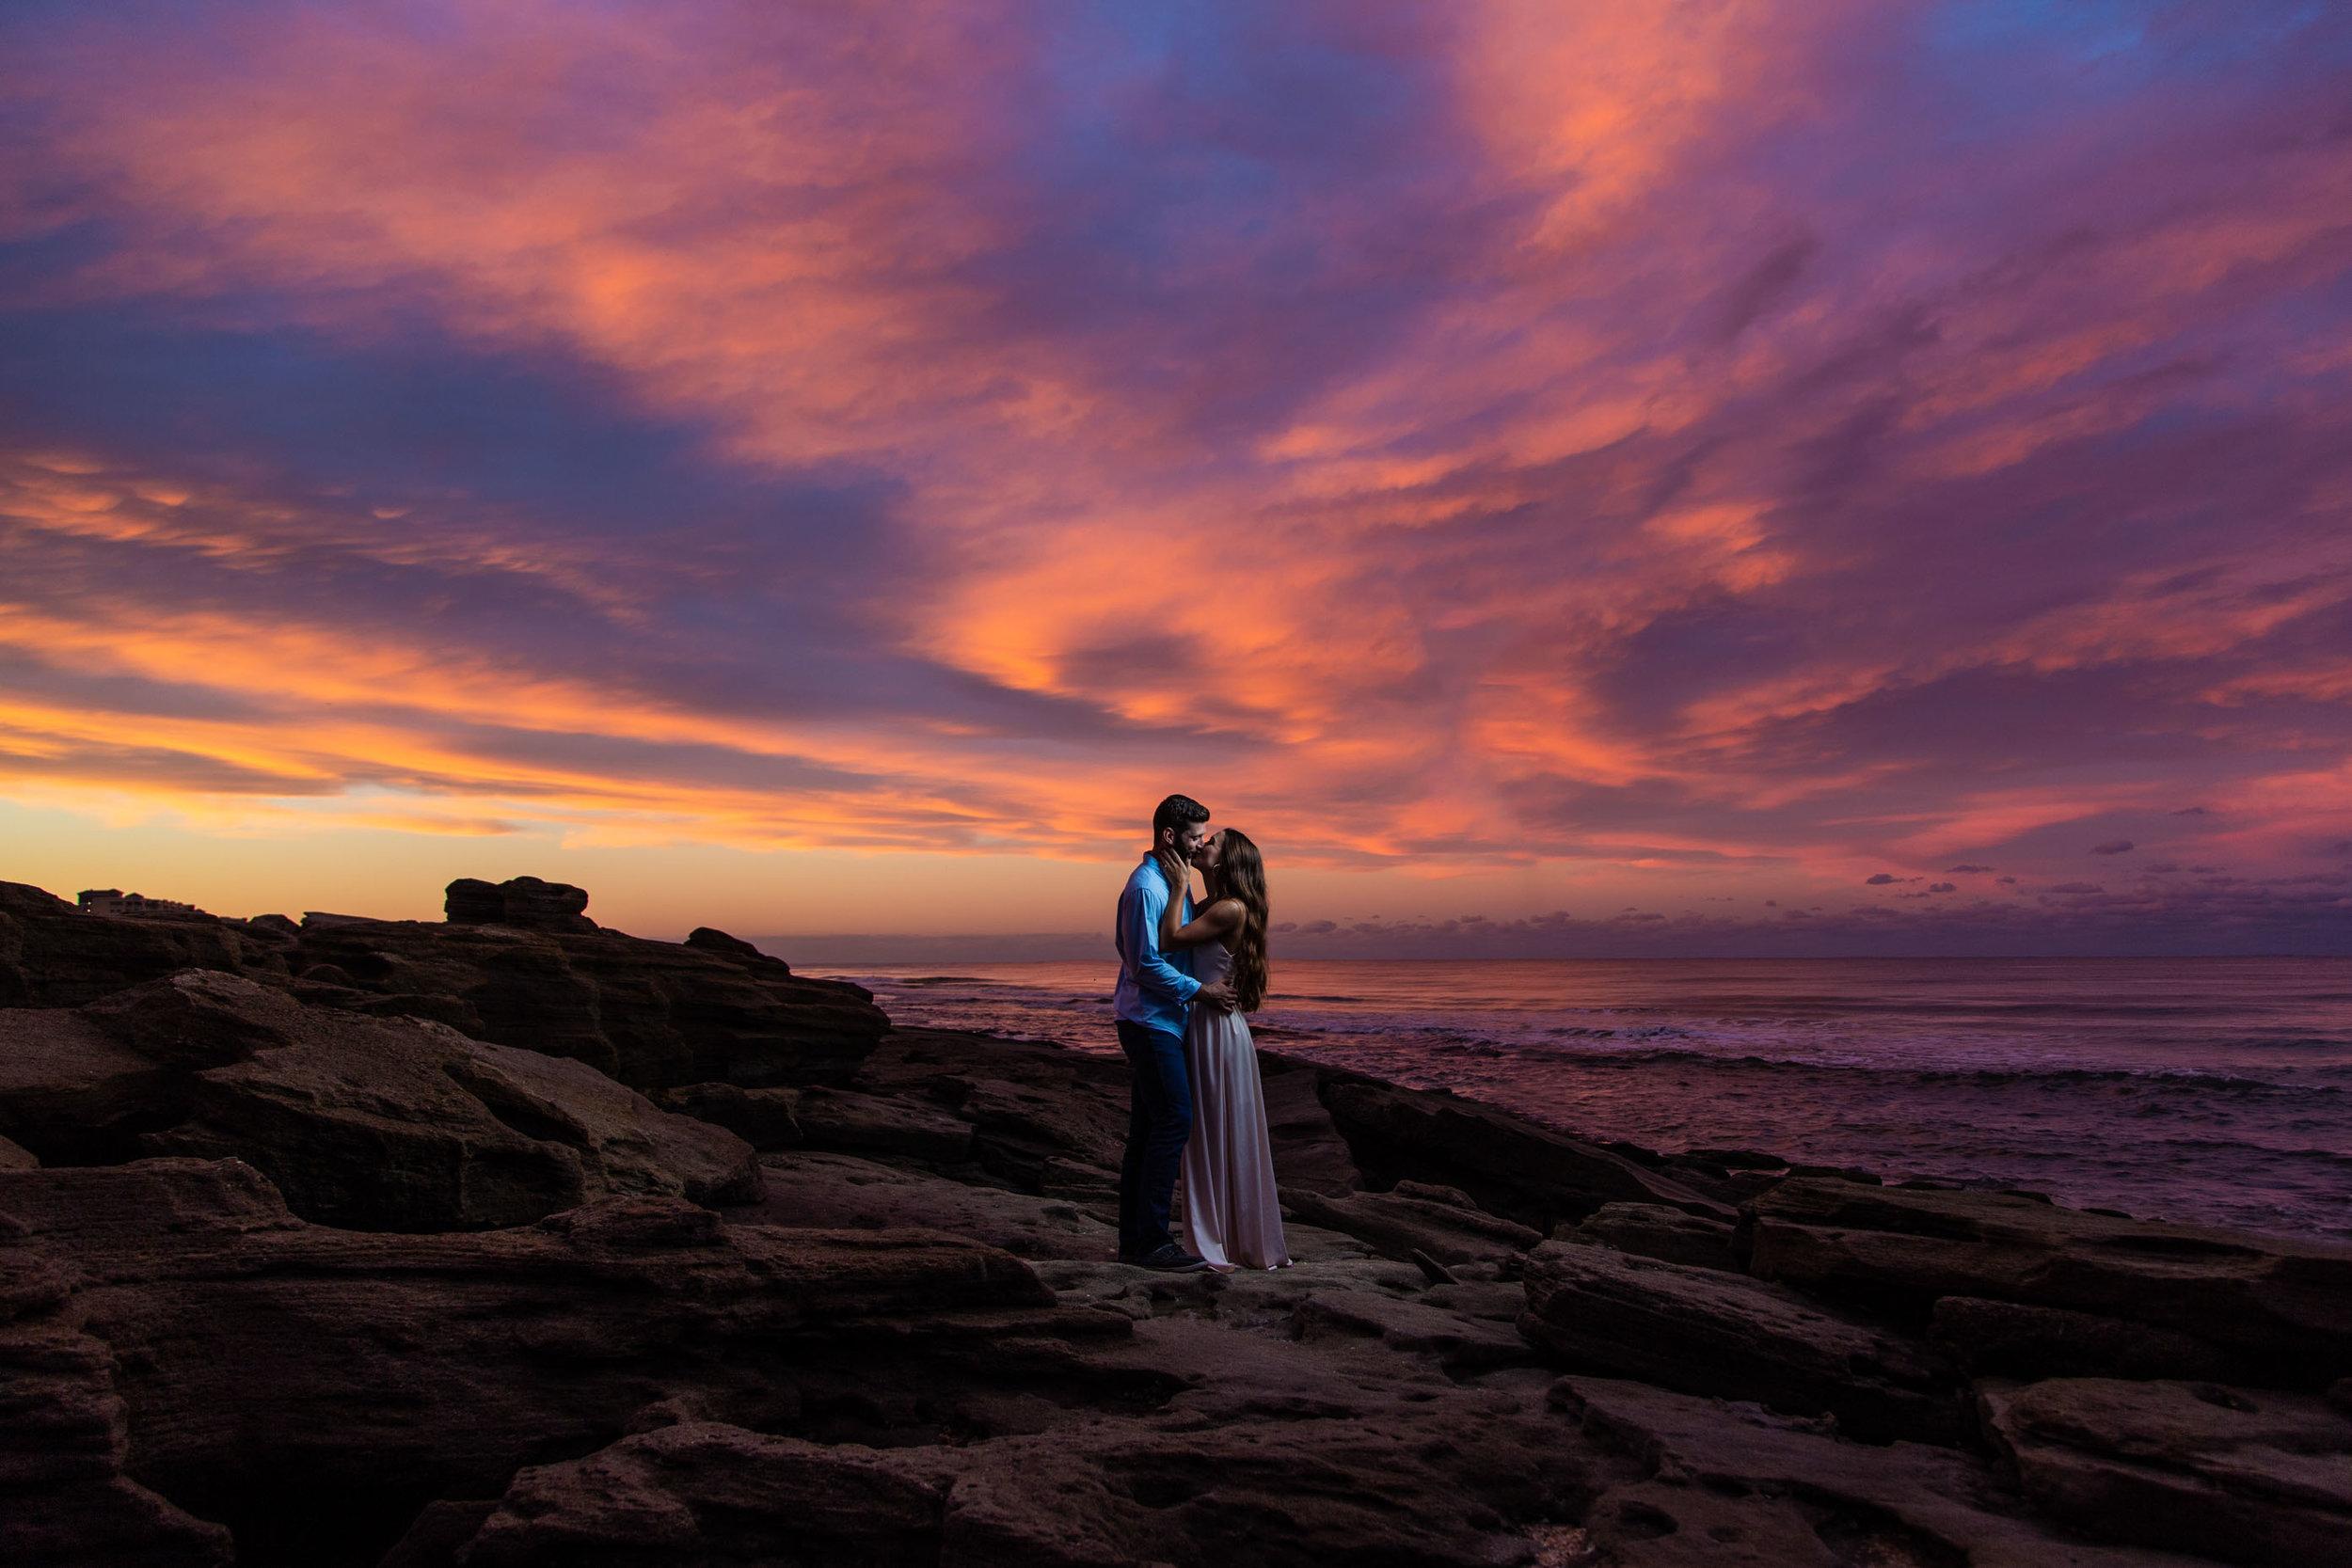 adam-szarmack-jacksonville-wedding-photographer-palm-coast-washing-oaks-garden-state-park-engagement-63.jpg